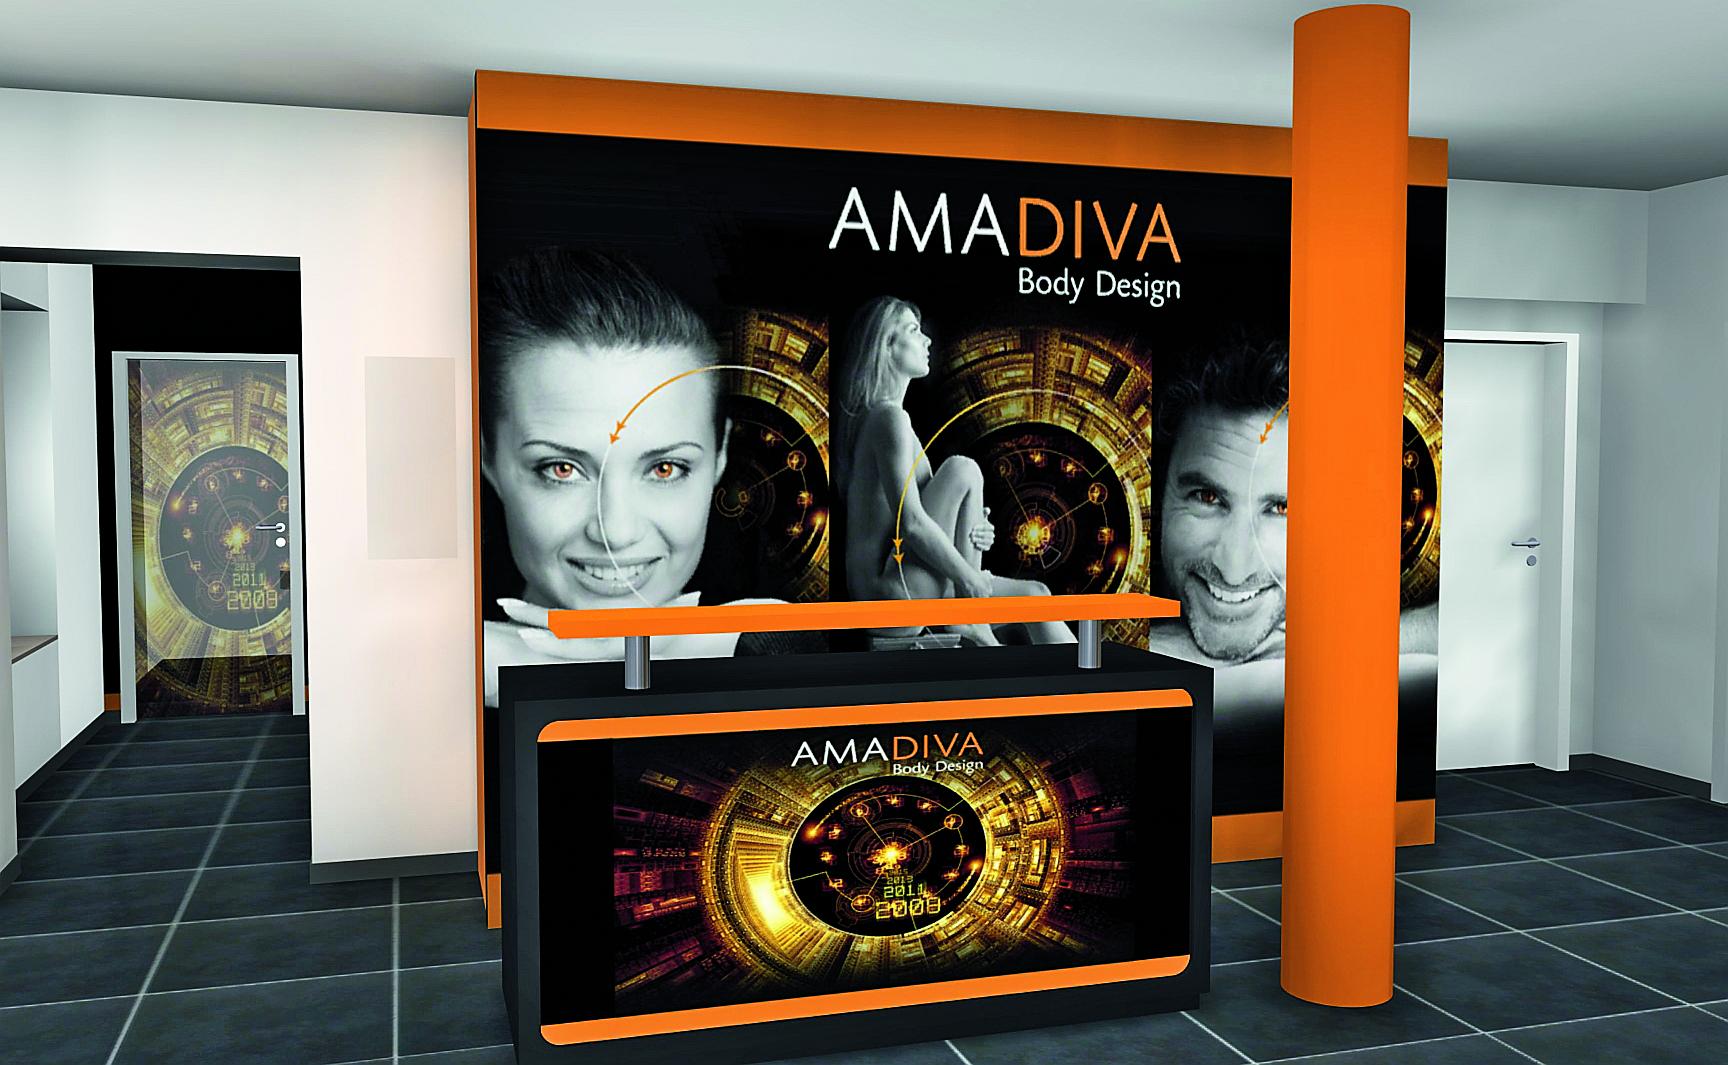 AMADIVA_Studio-1_02_04_14_2.jpg